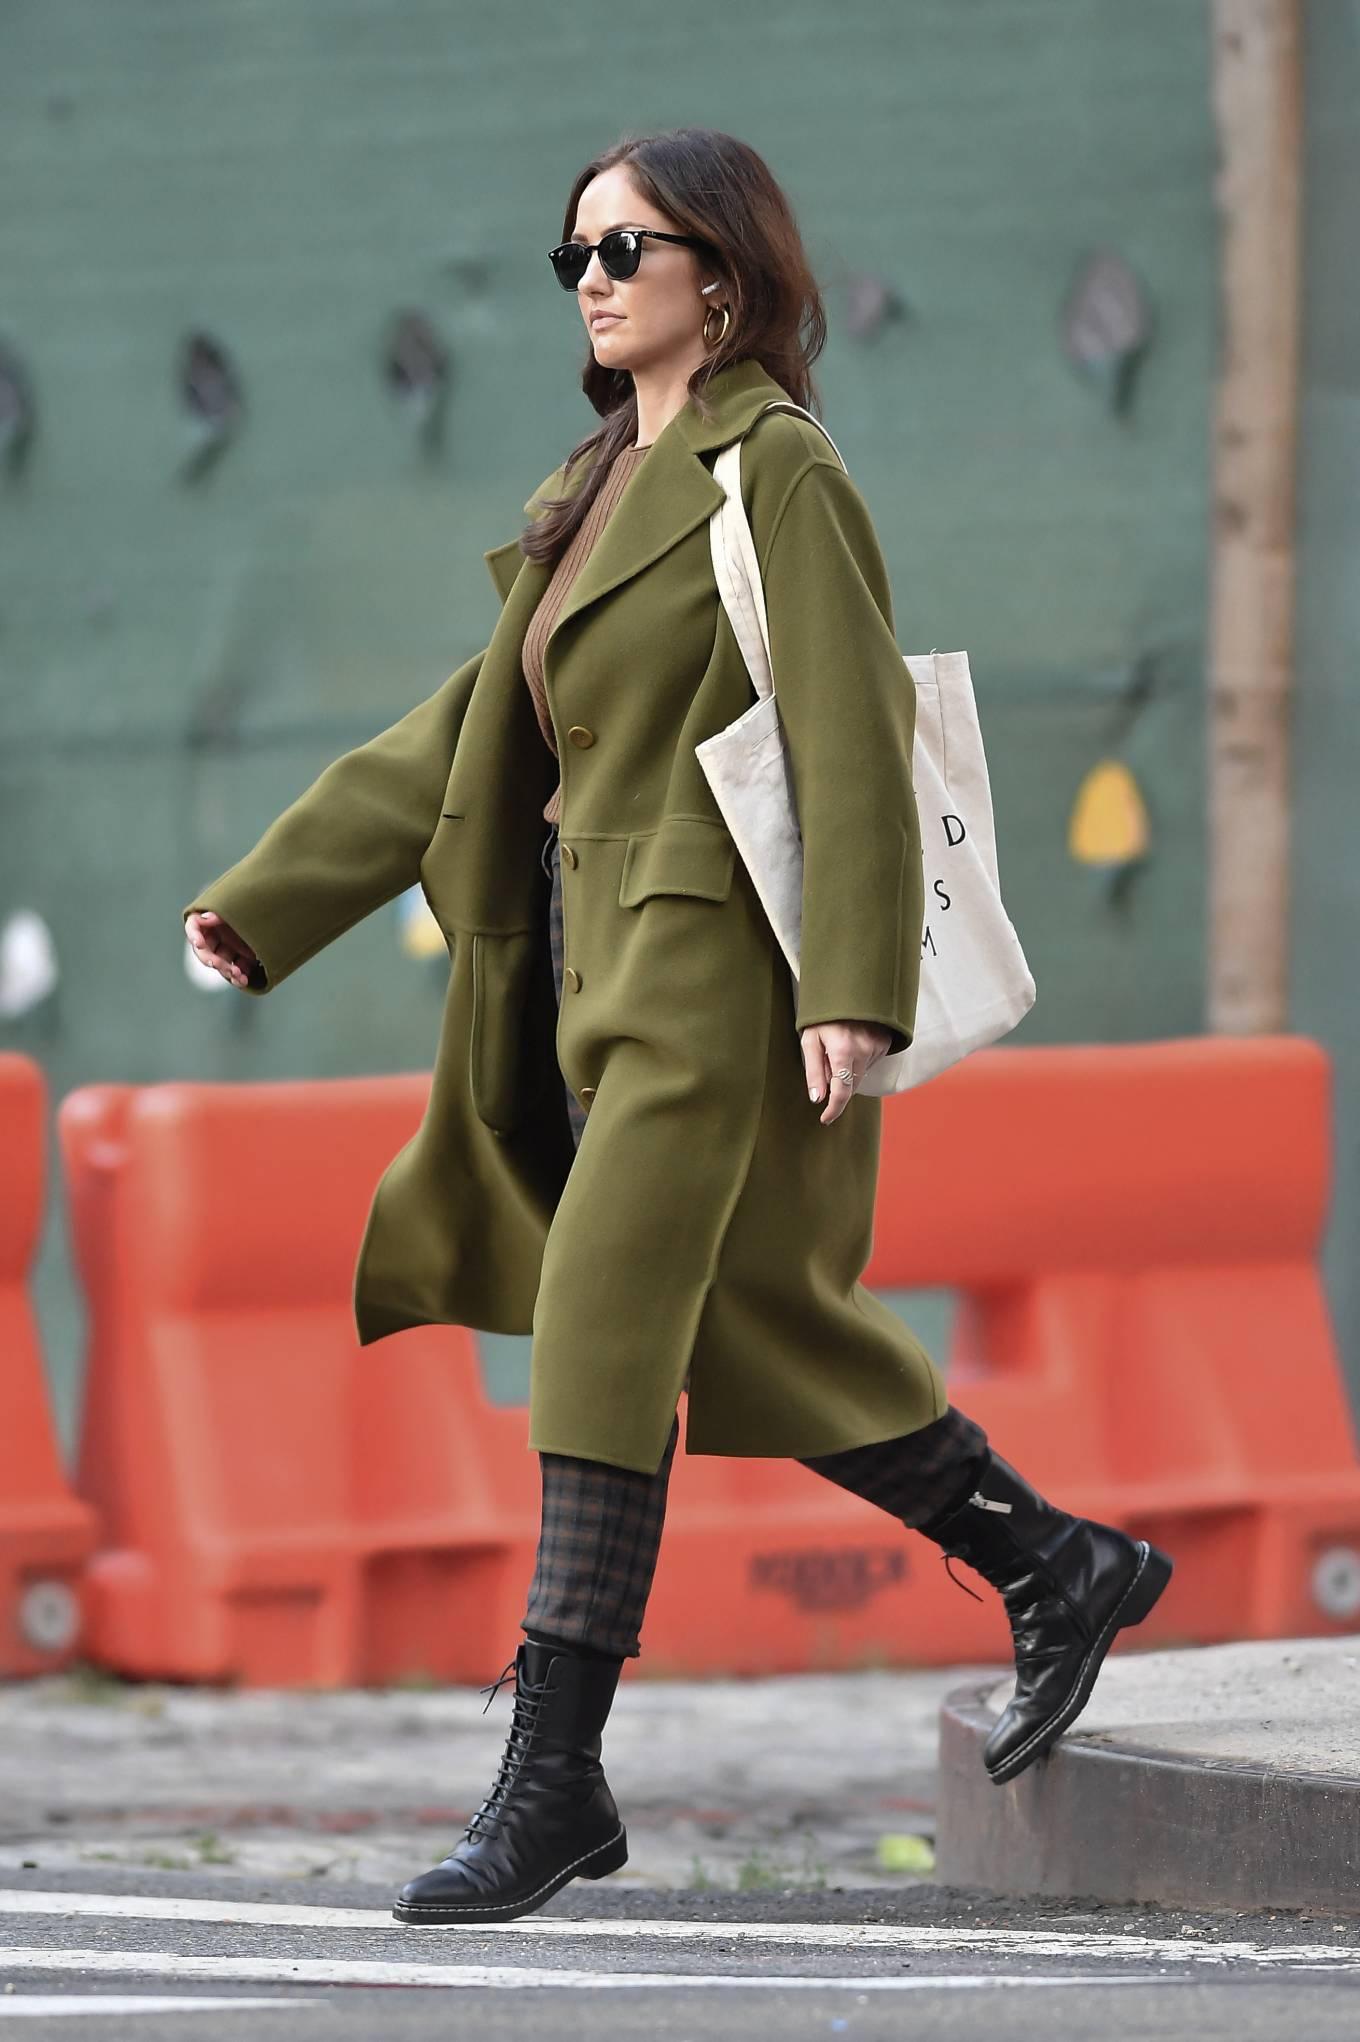 Minka Kelly 2021 : Minka Kelly – In olive green runs errands in New York-09